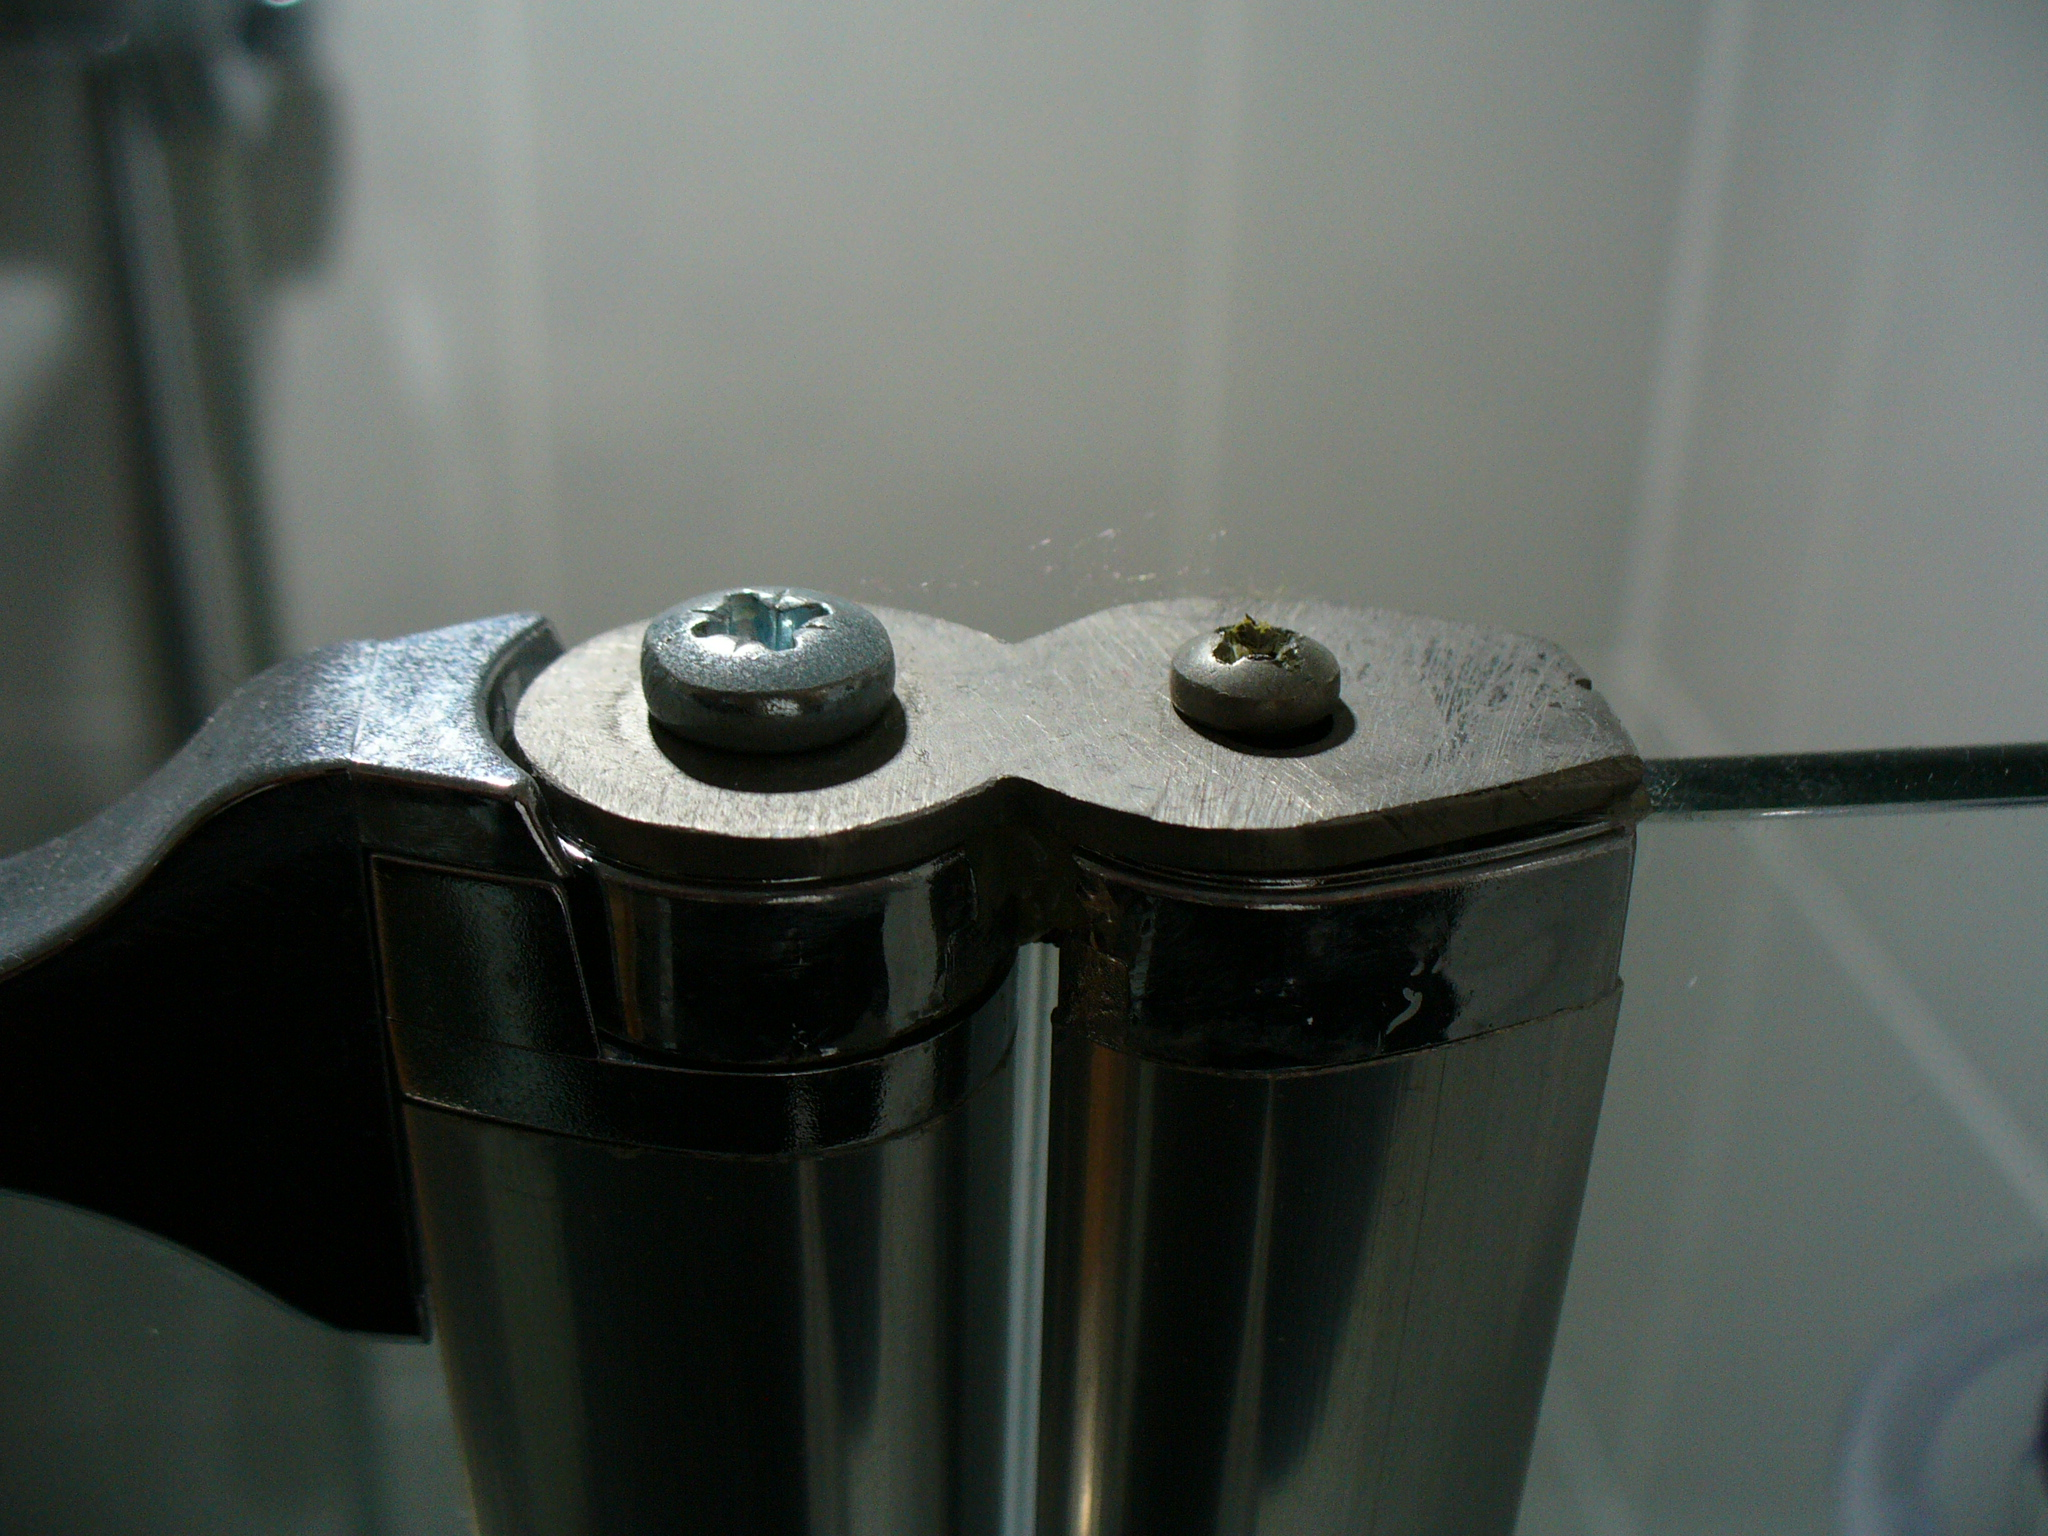 Shower Screen Pivot Hinge Broken Avforums